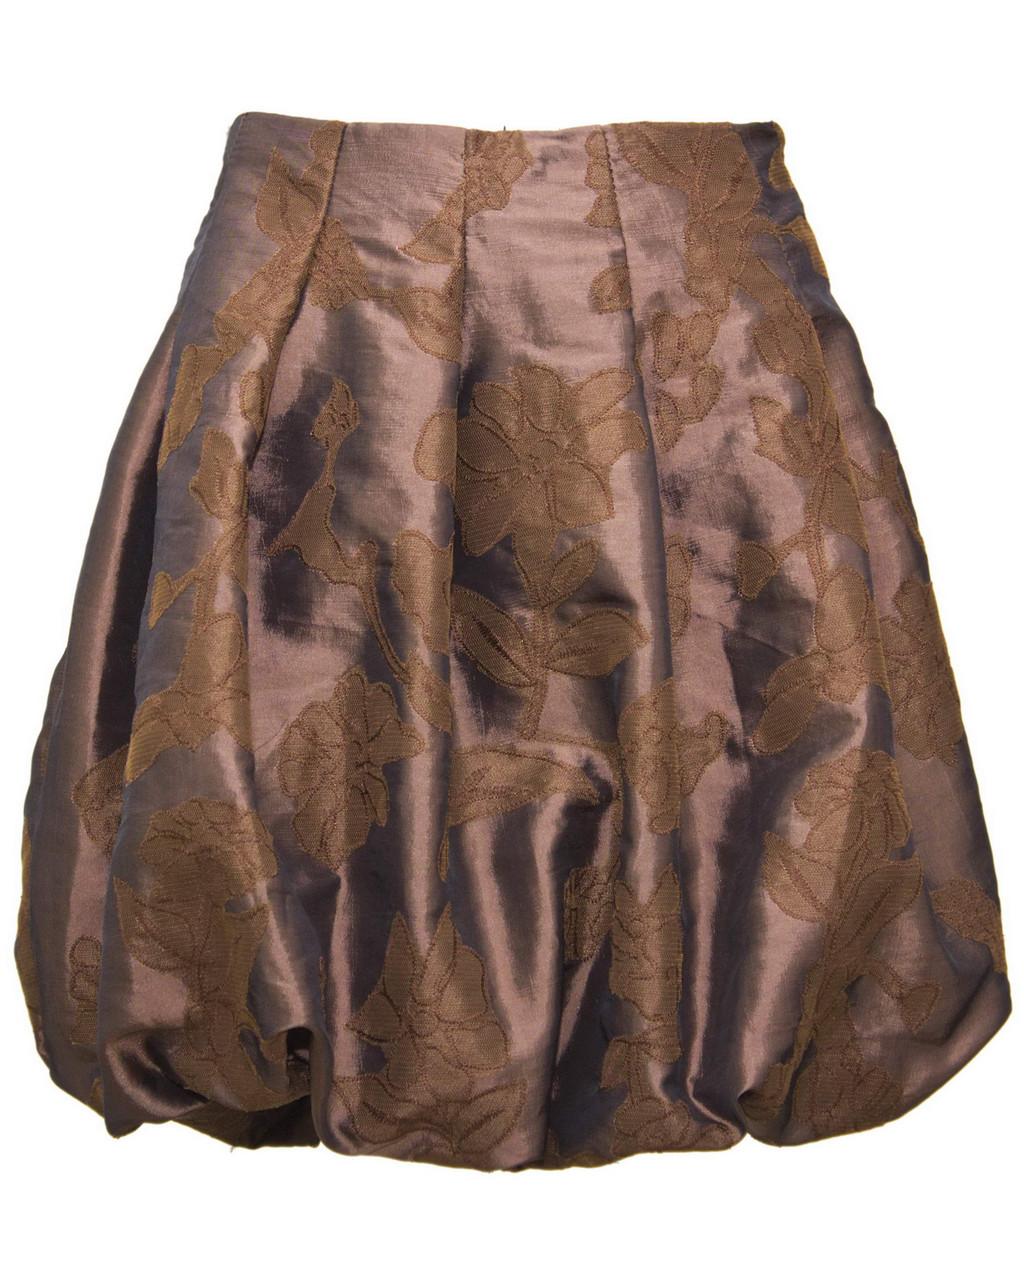 Юбка Баллон коричневая для девочки Размер 122-128